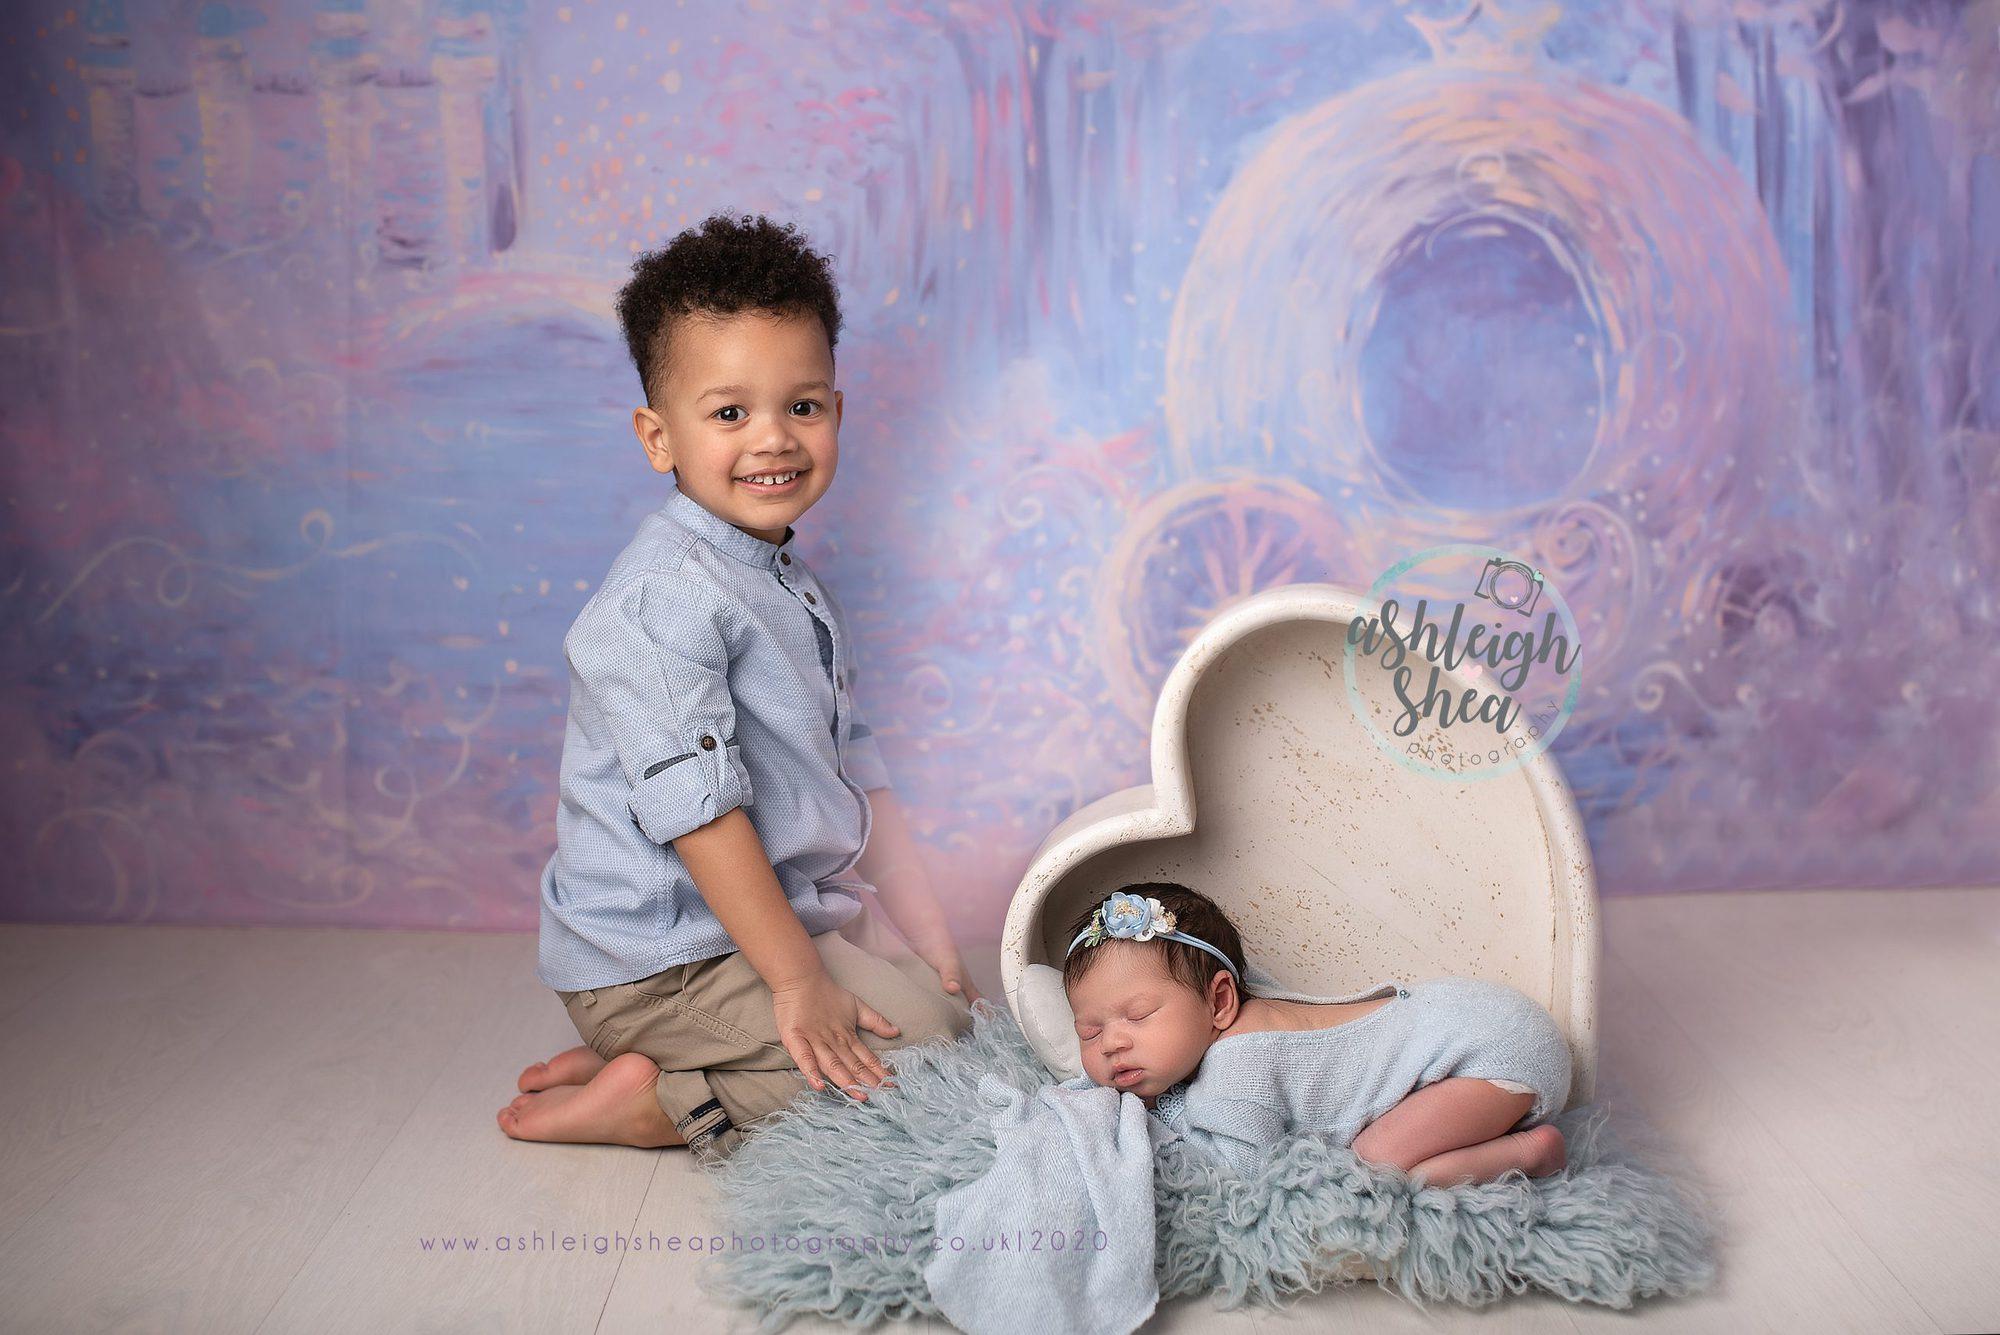 Ashleigh Shea Photography, Prince Charming, Big Brother, Cinderella Inspired, Disney Inspired, Heidi Hope Backdrop, Princess,